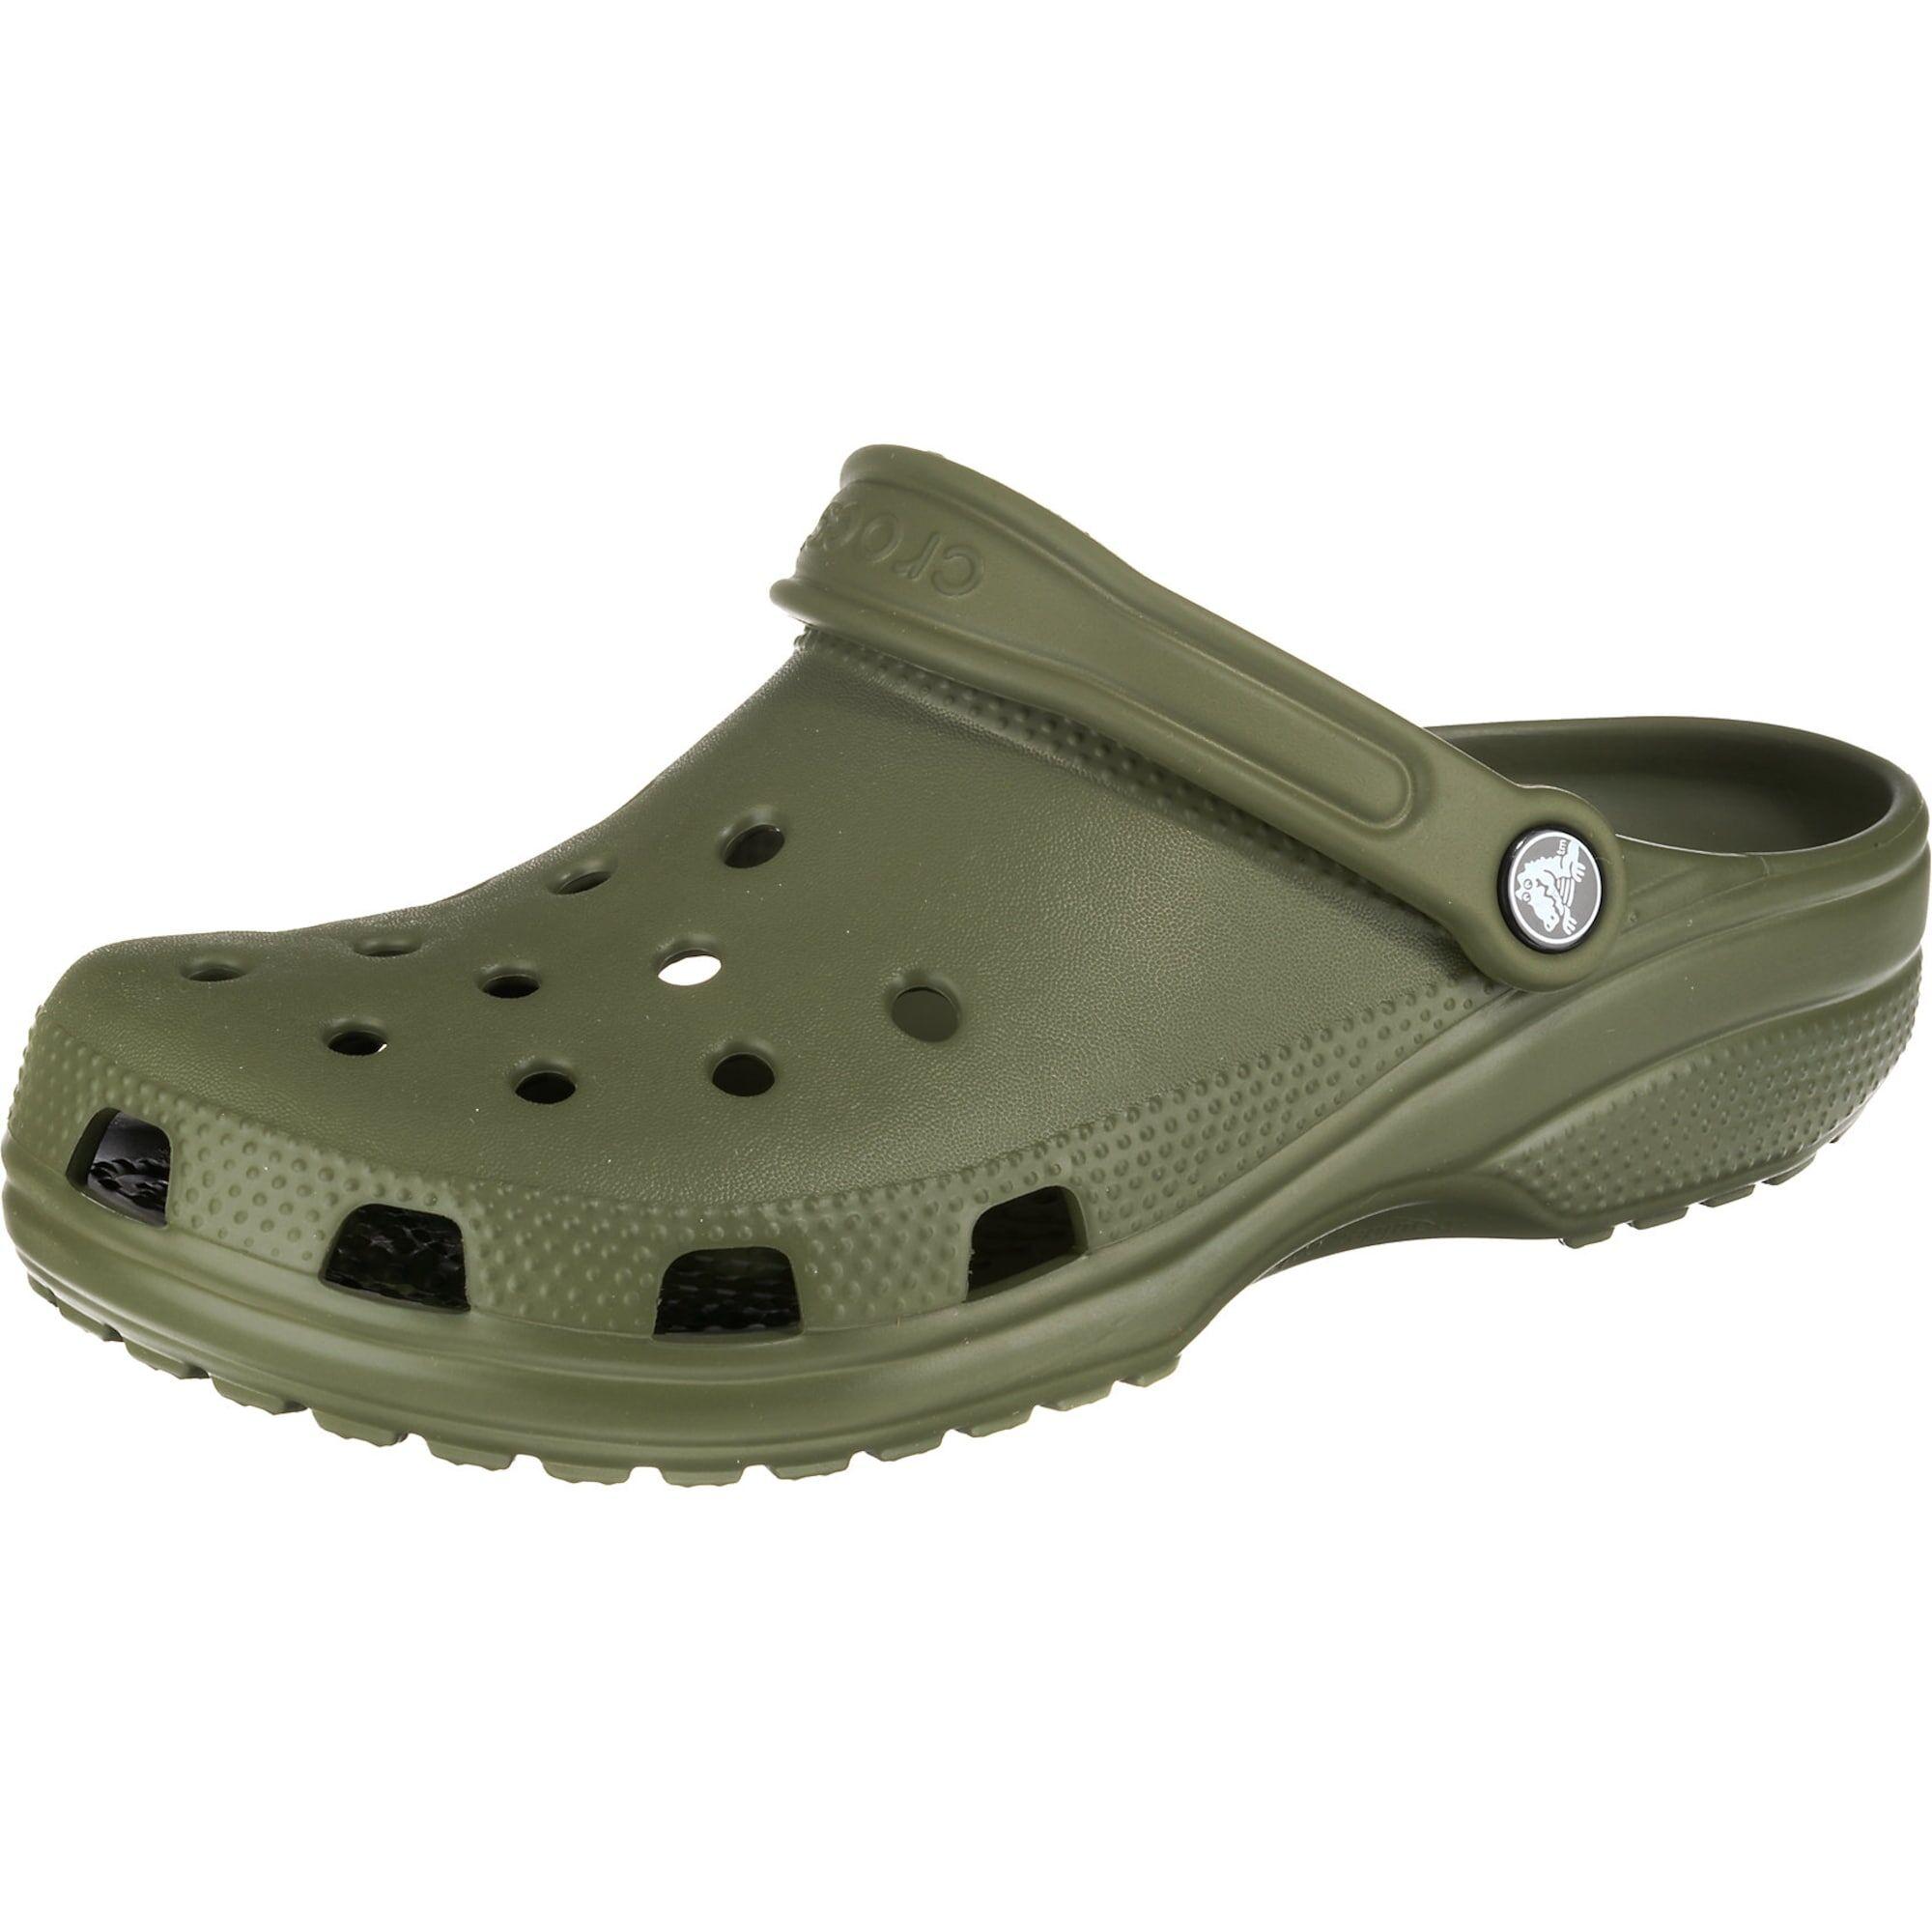 Crocs Sabots  - Vert - Taille: 41.5 - male